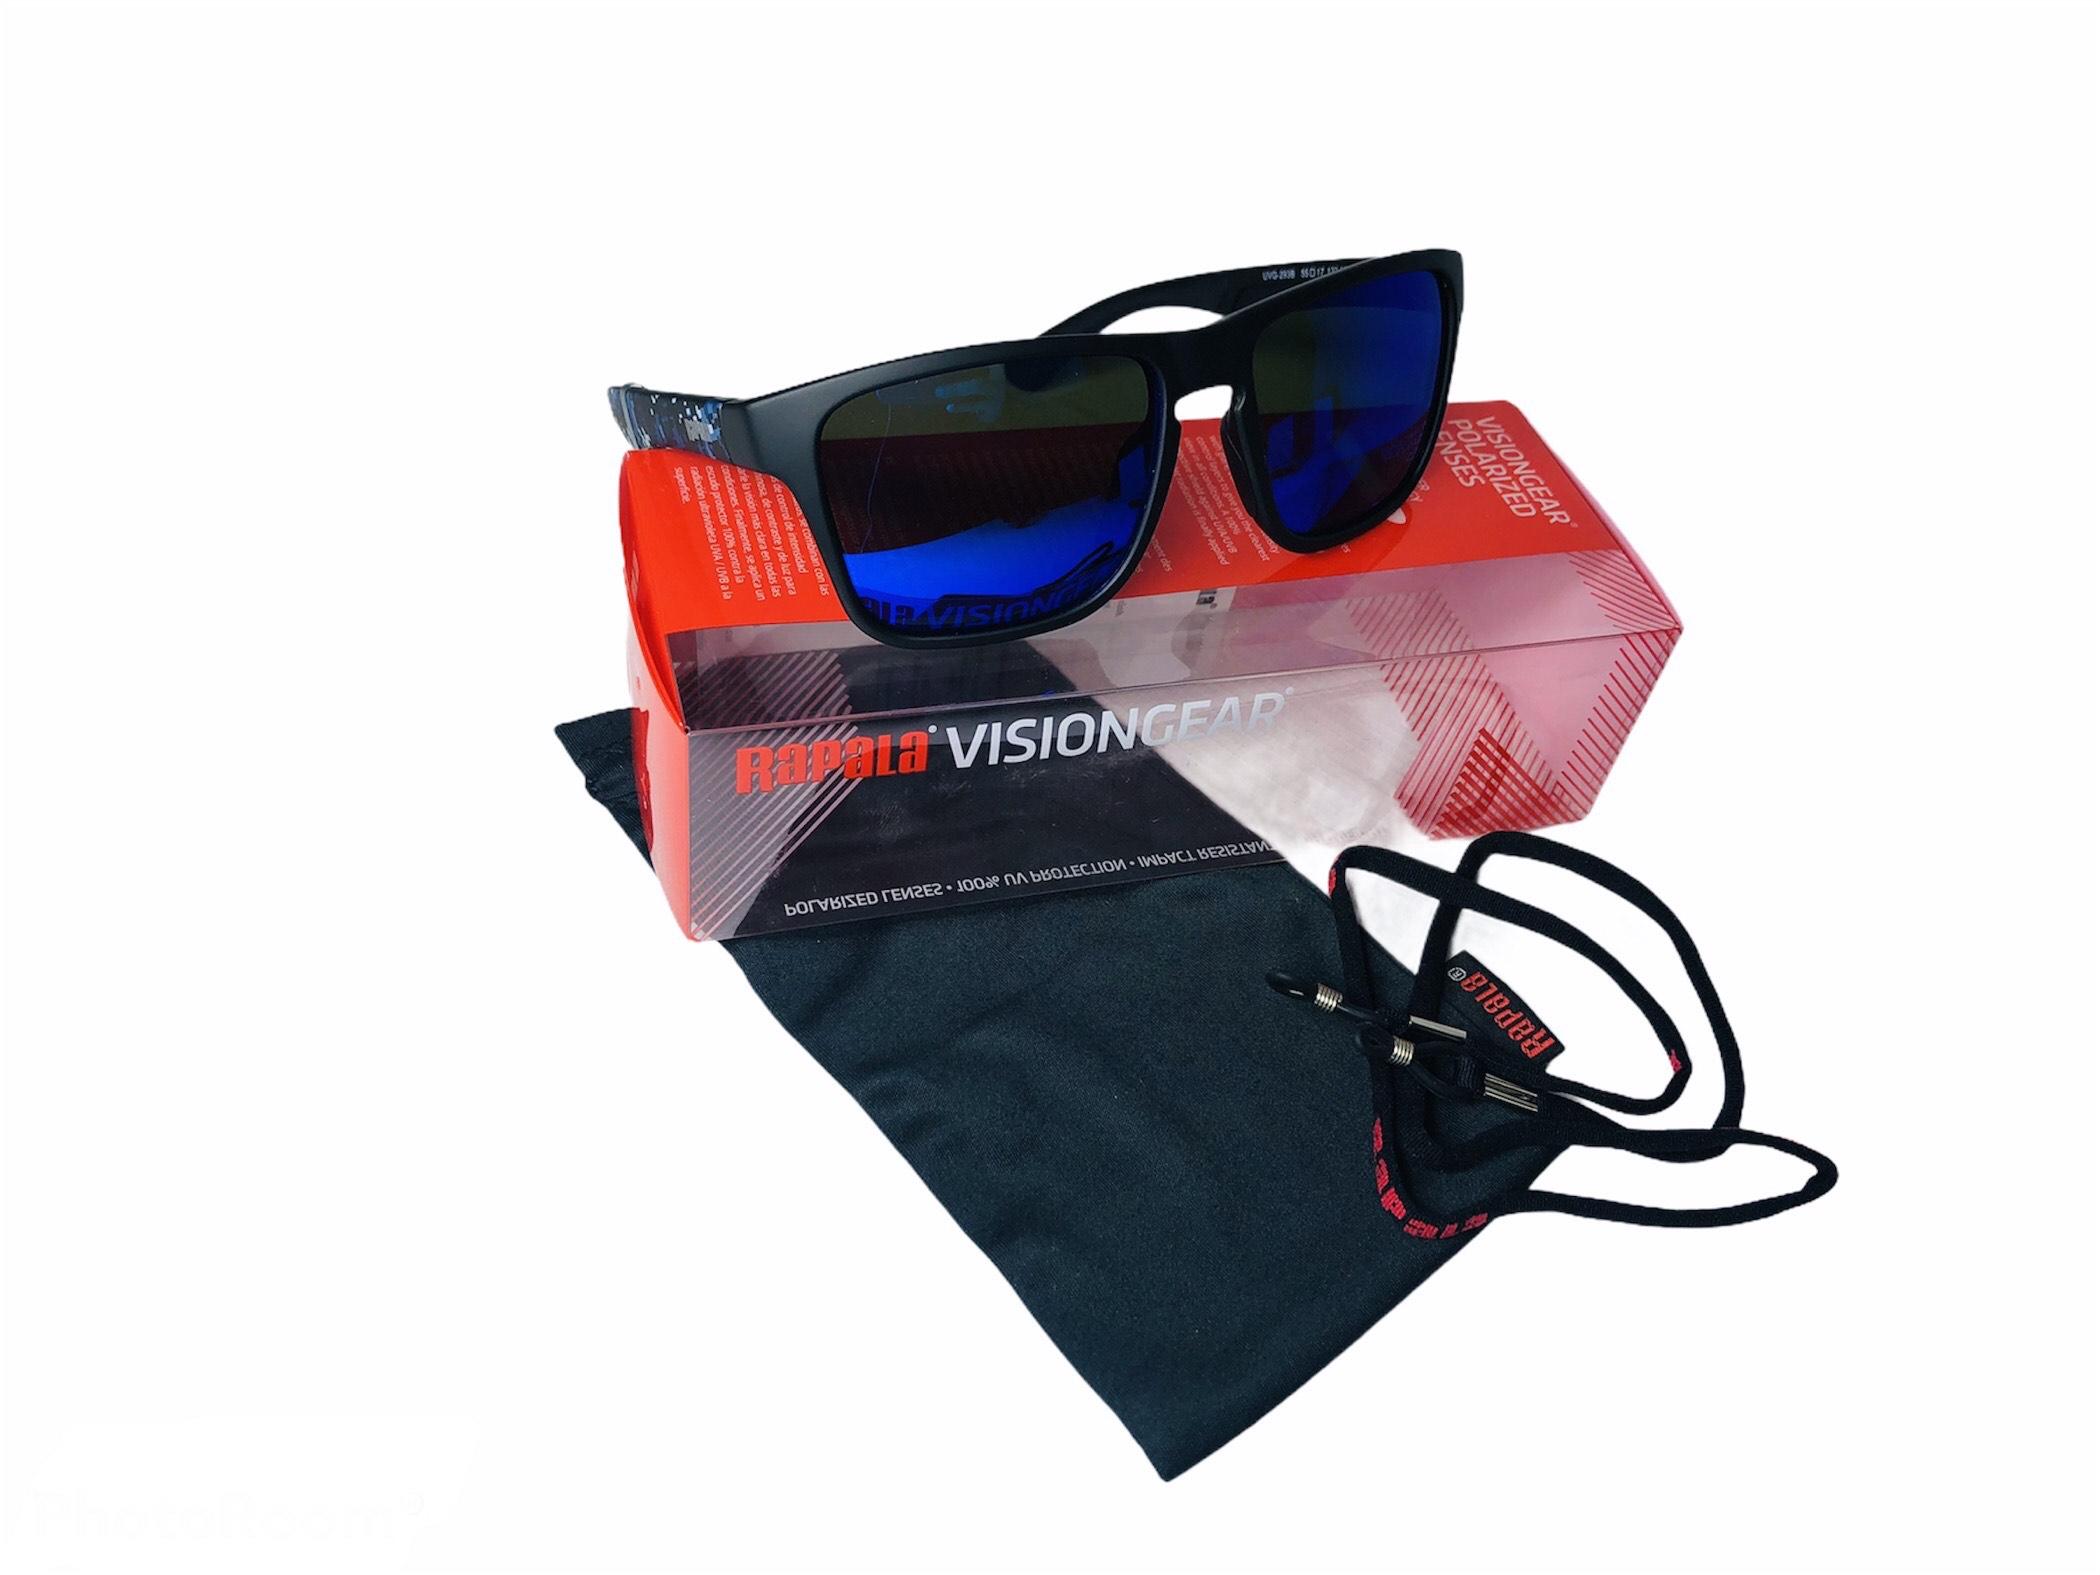 rapala vision gear UVG-293B